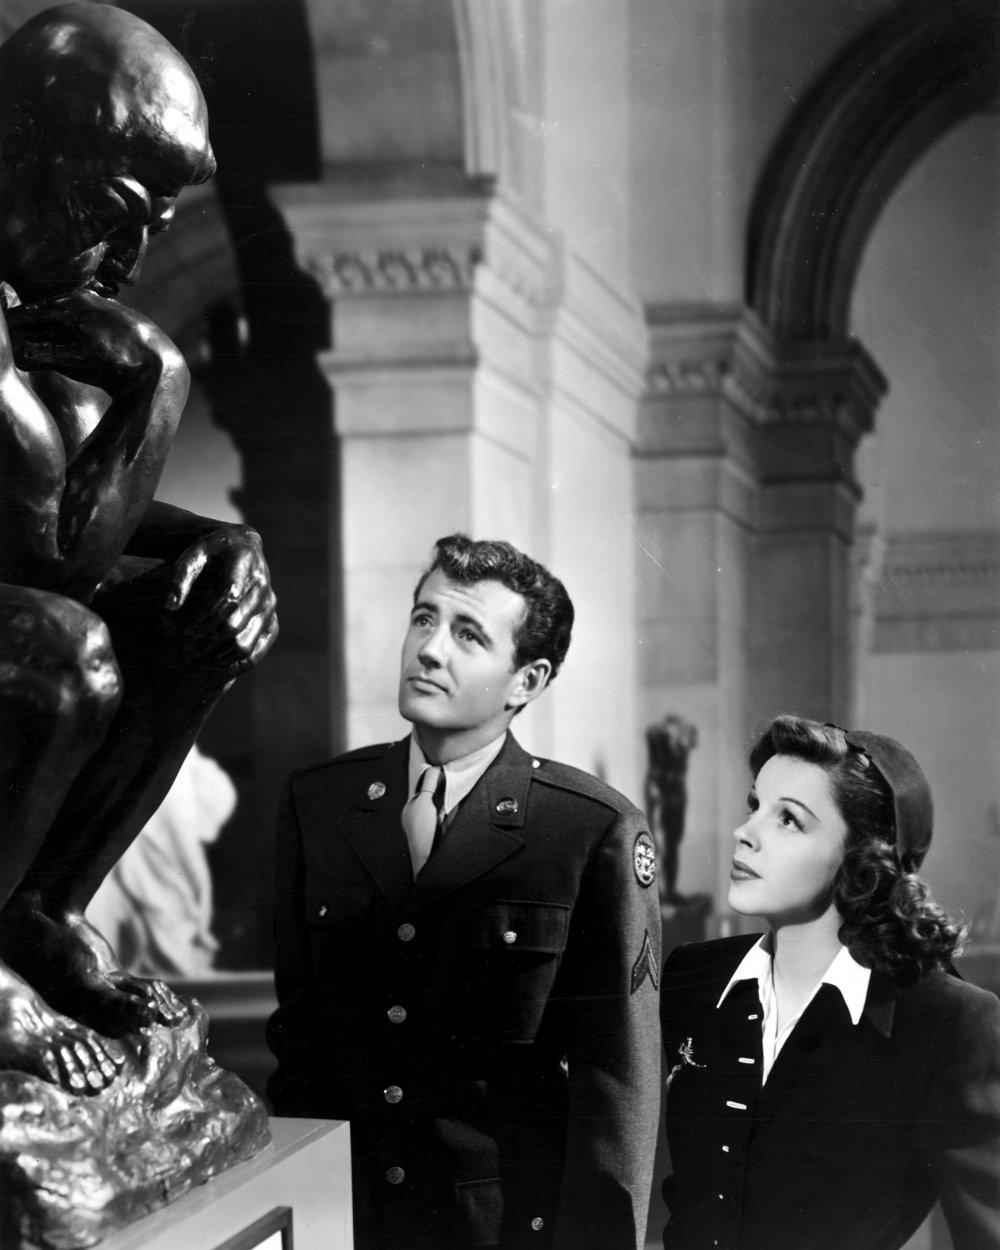 Robert Walker and Judy Garland in The Clock